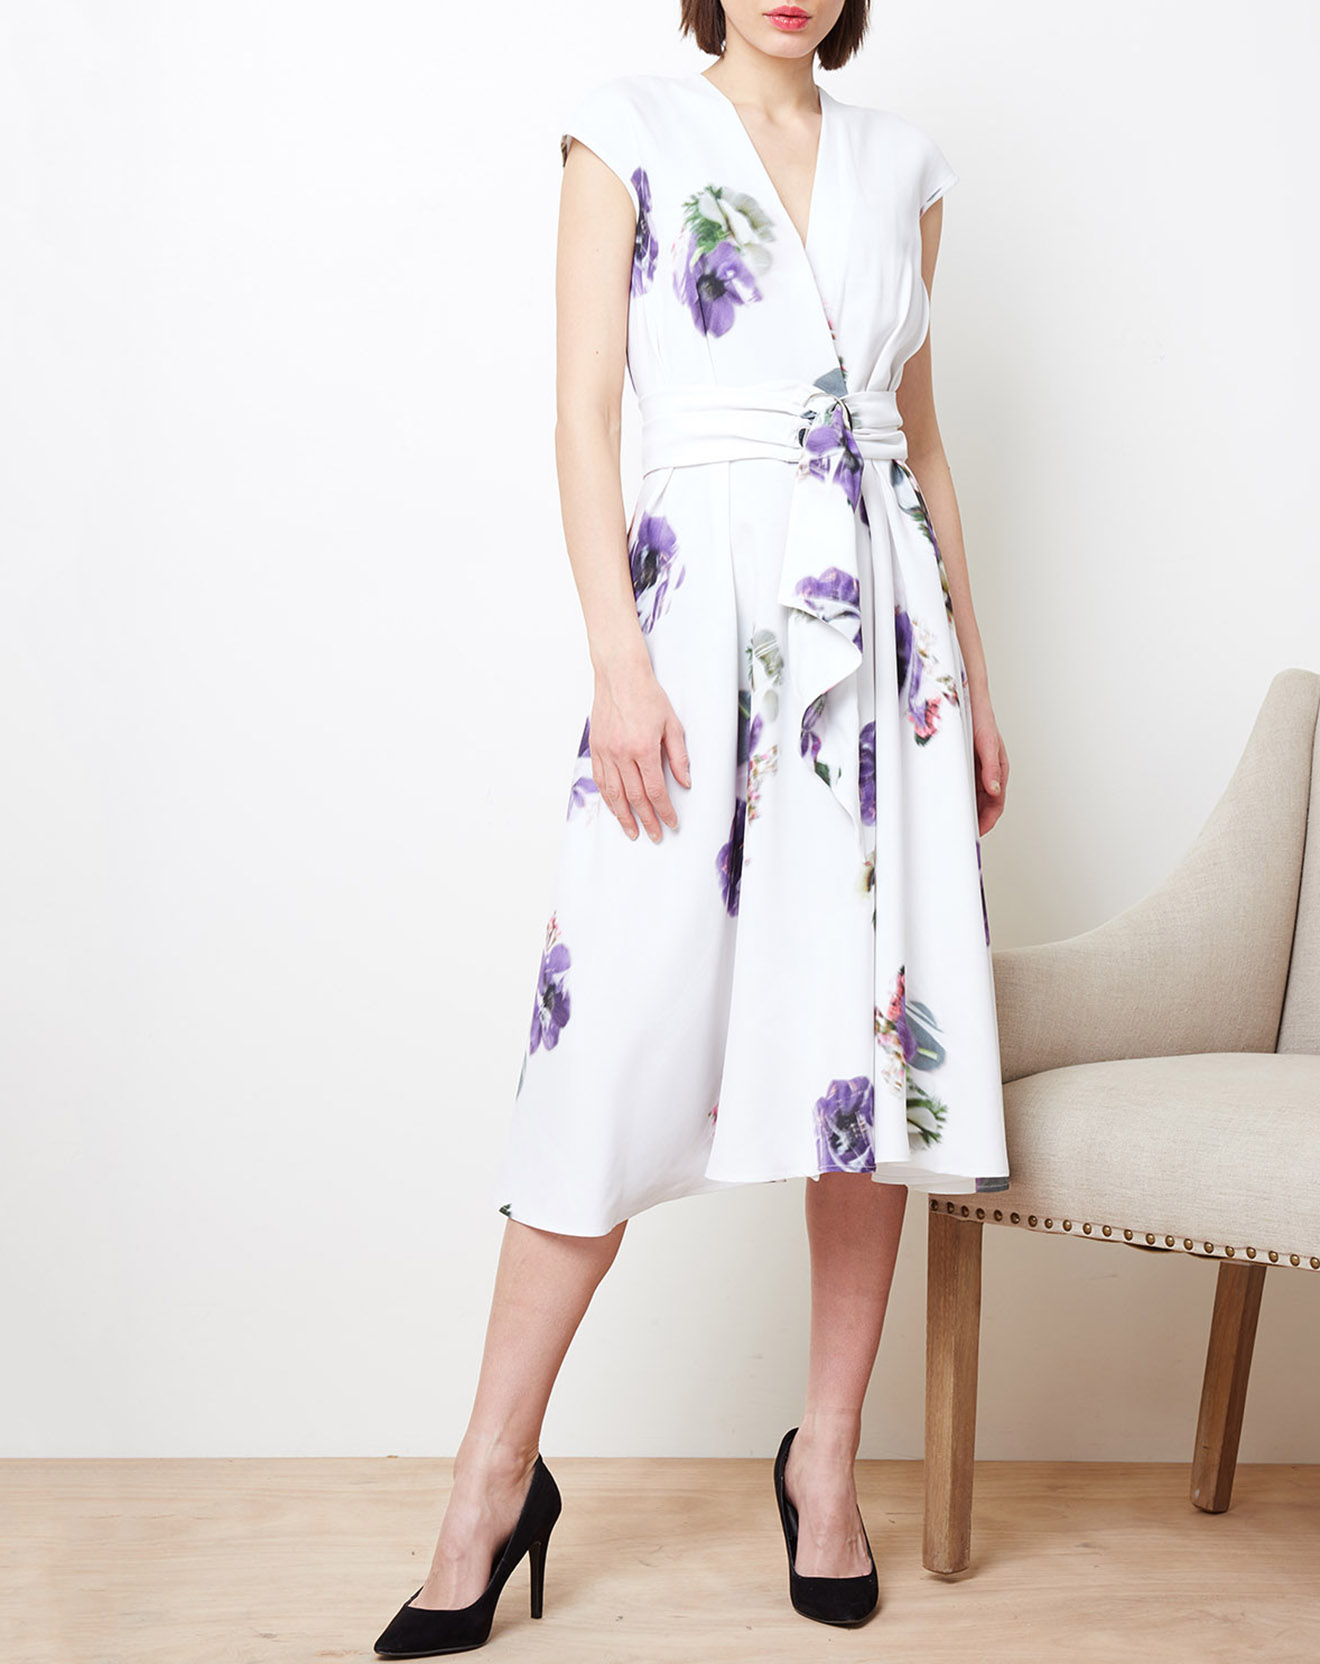 Robe portefeuille imprimée floral blanc/violet - Cacharel - Modalova